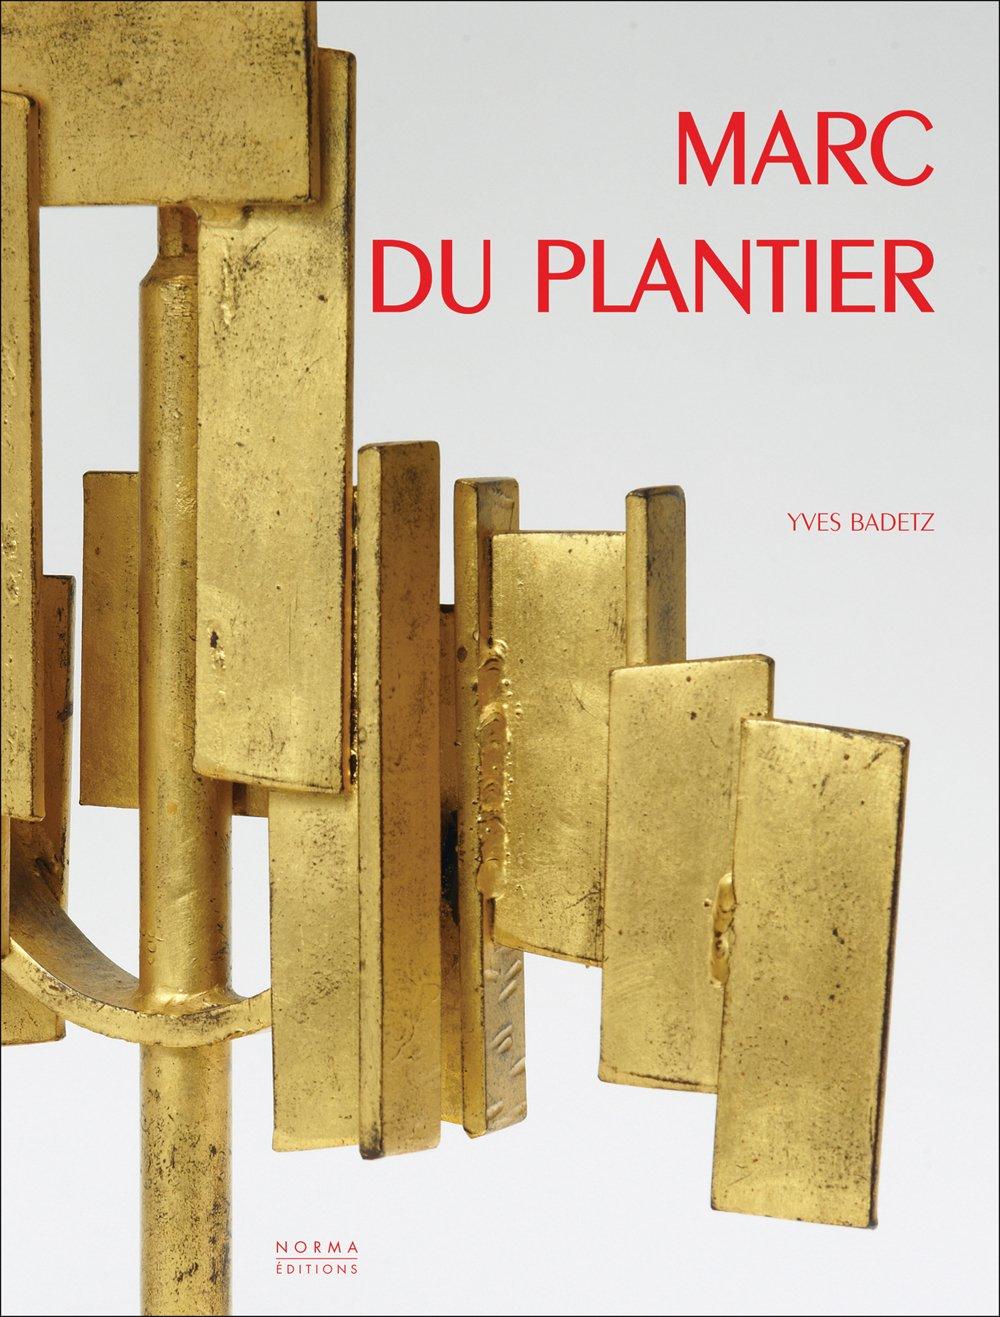 Marc Du Plantier (French Edition)